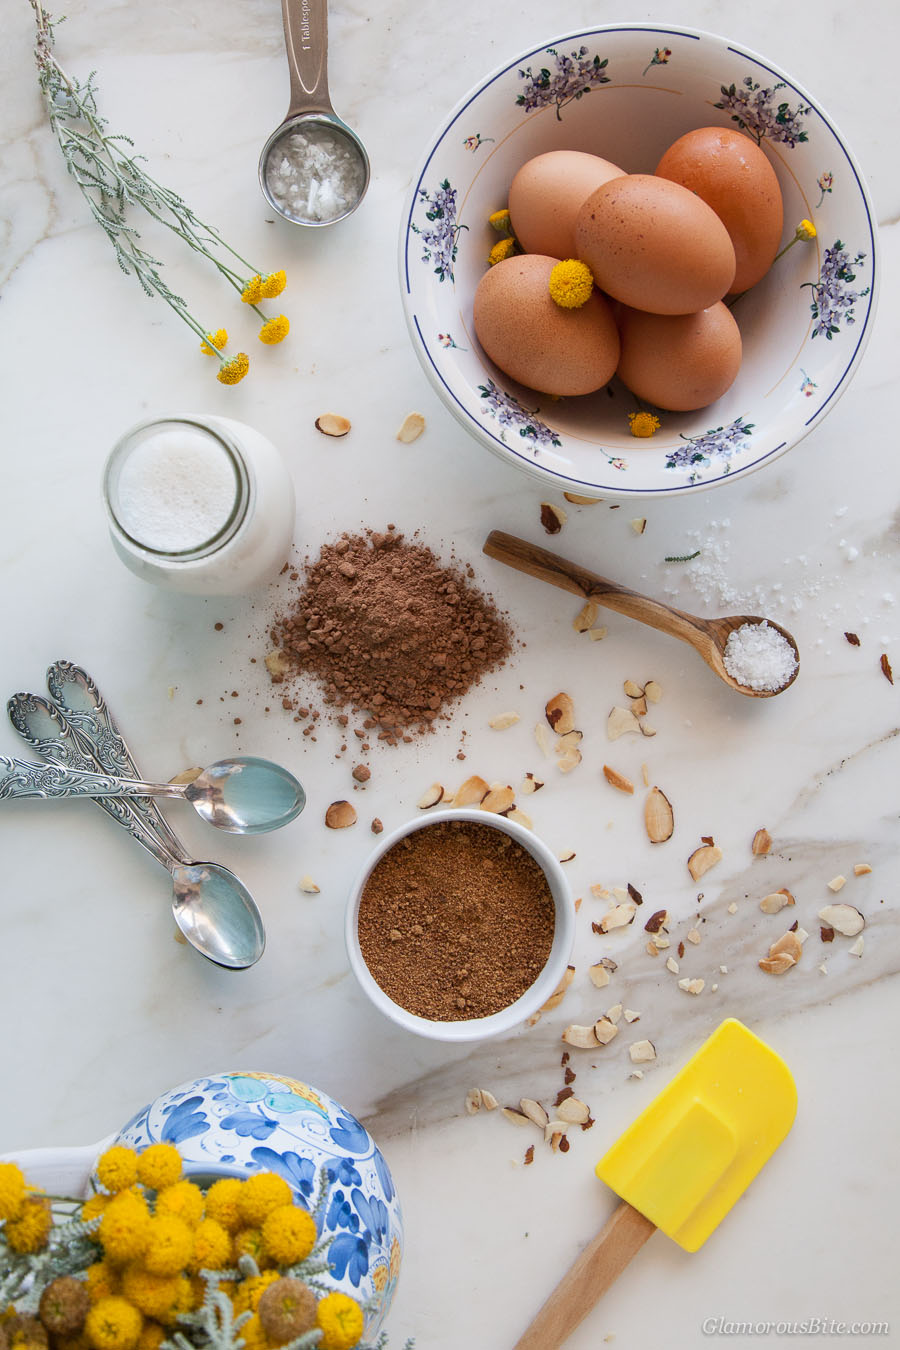 Chocolate Almond Gelato Ingredients